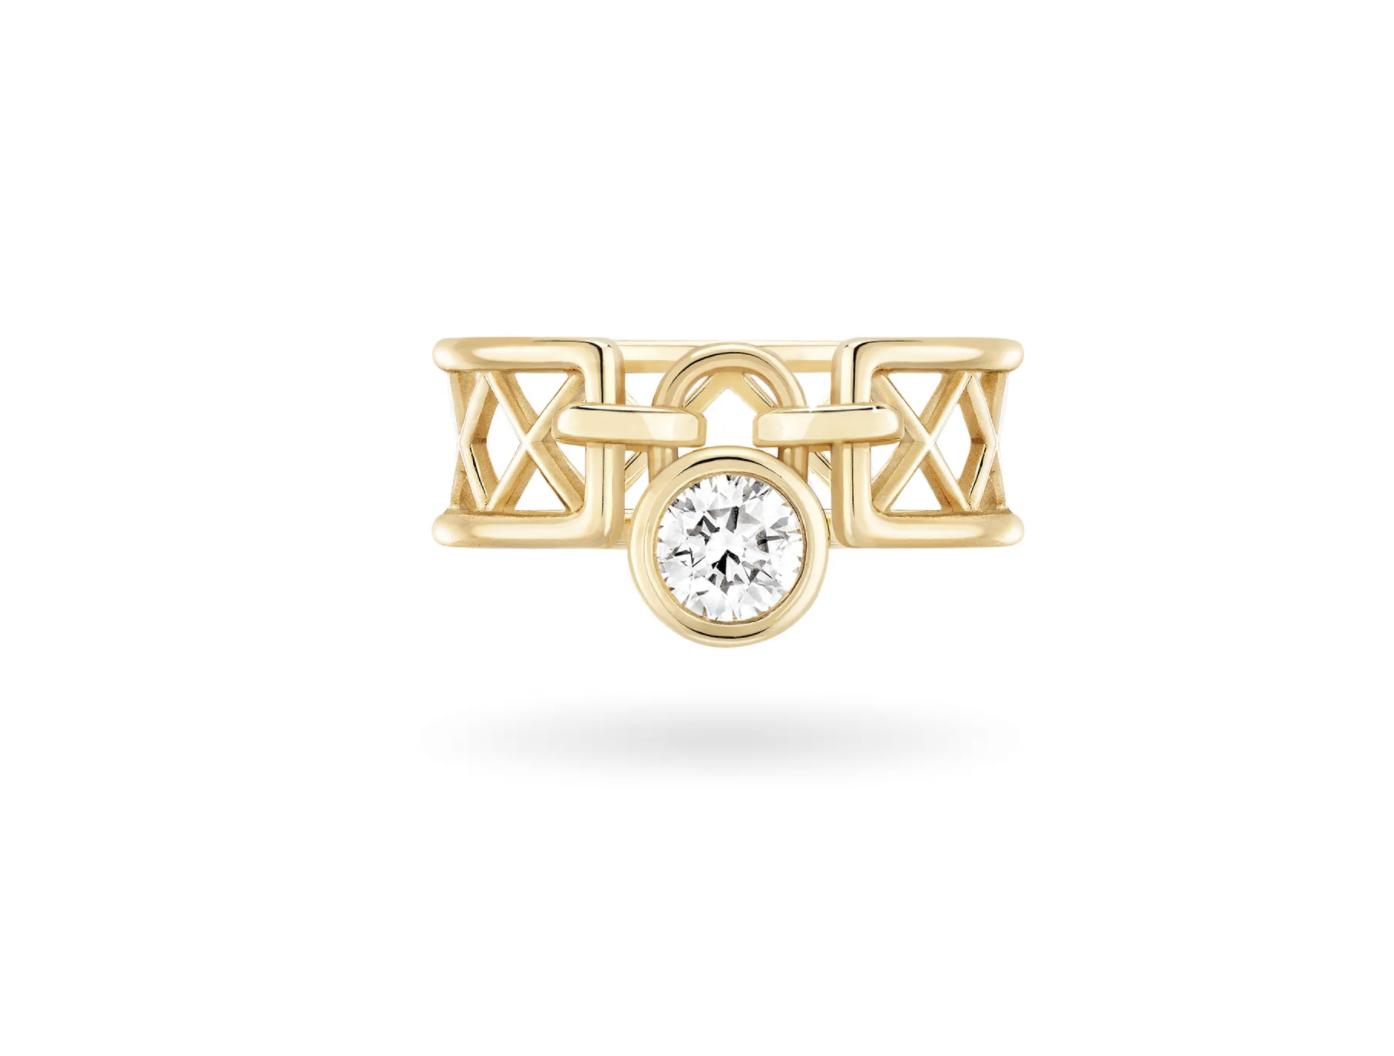 five-lab-grown-diamond-brands-to-know-courbet-jewellery